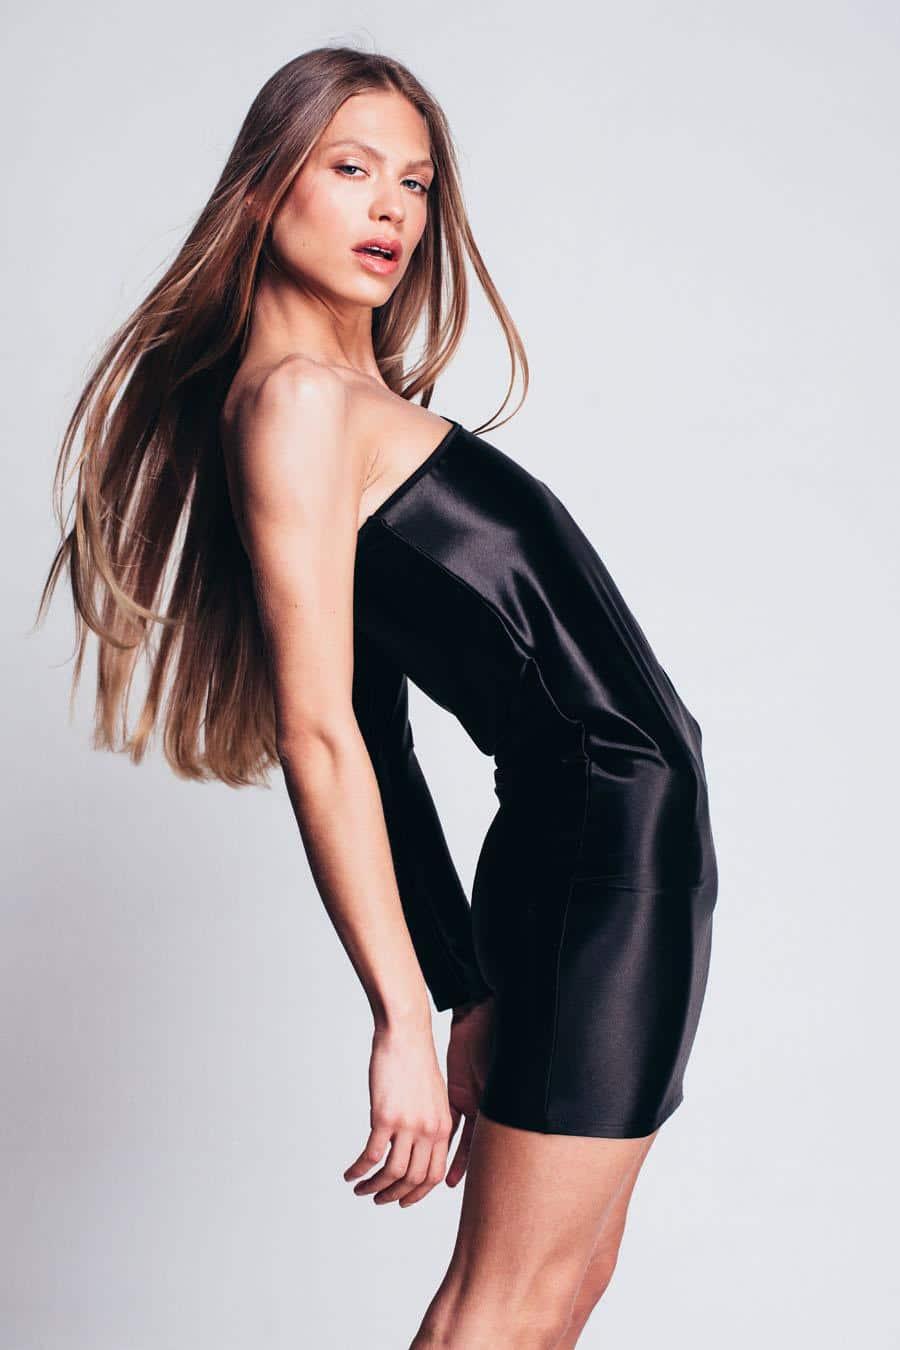 jagger zenska haljina kolekcija prolece leto 2021 ss 2021 kupi online jg 5515 01 6